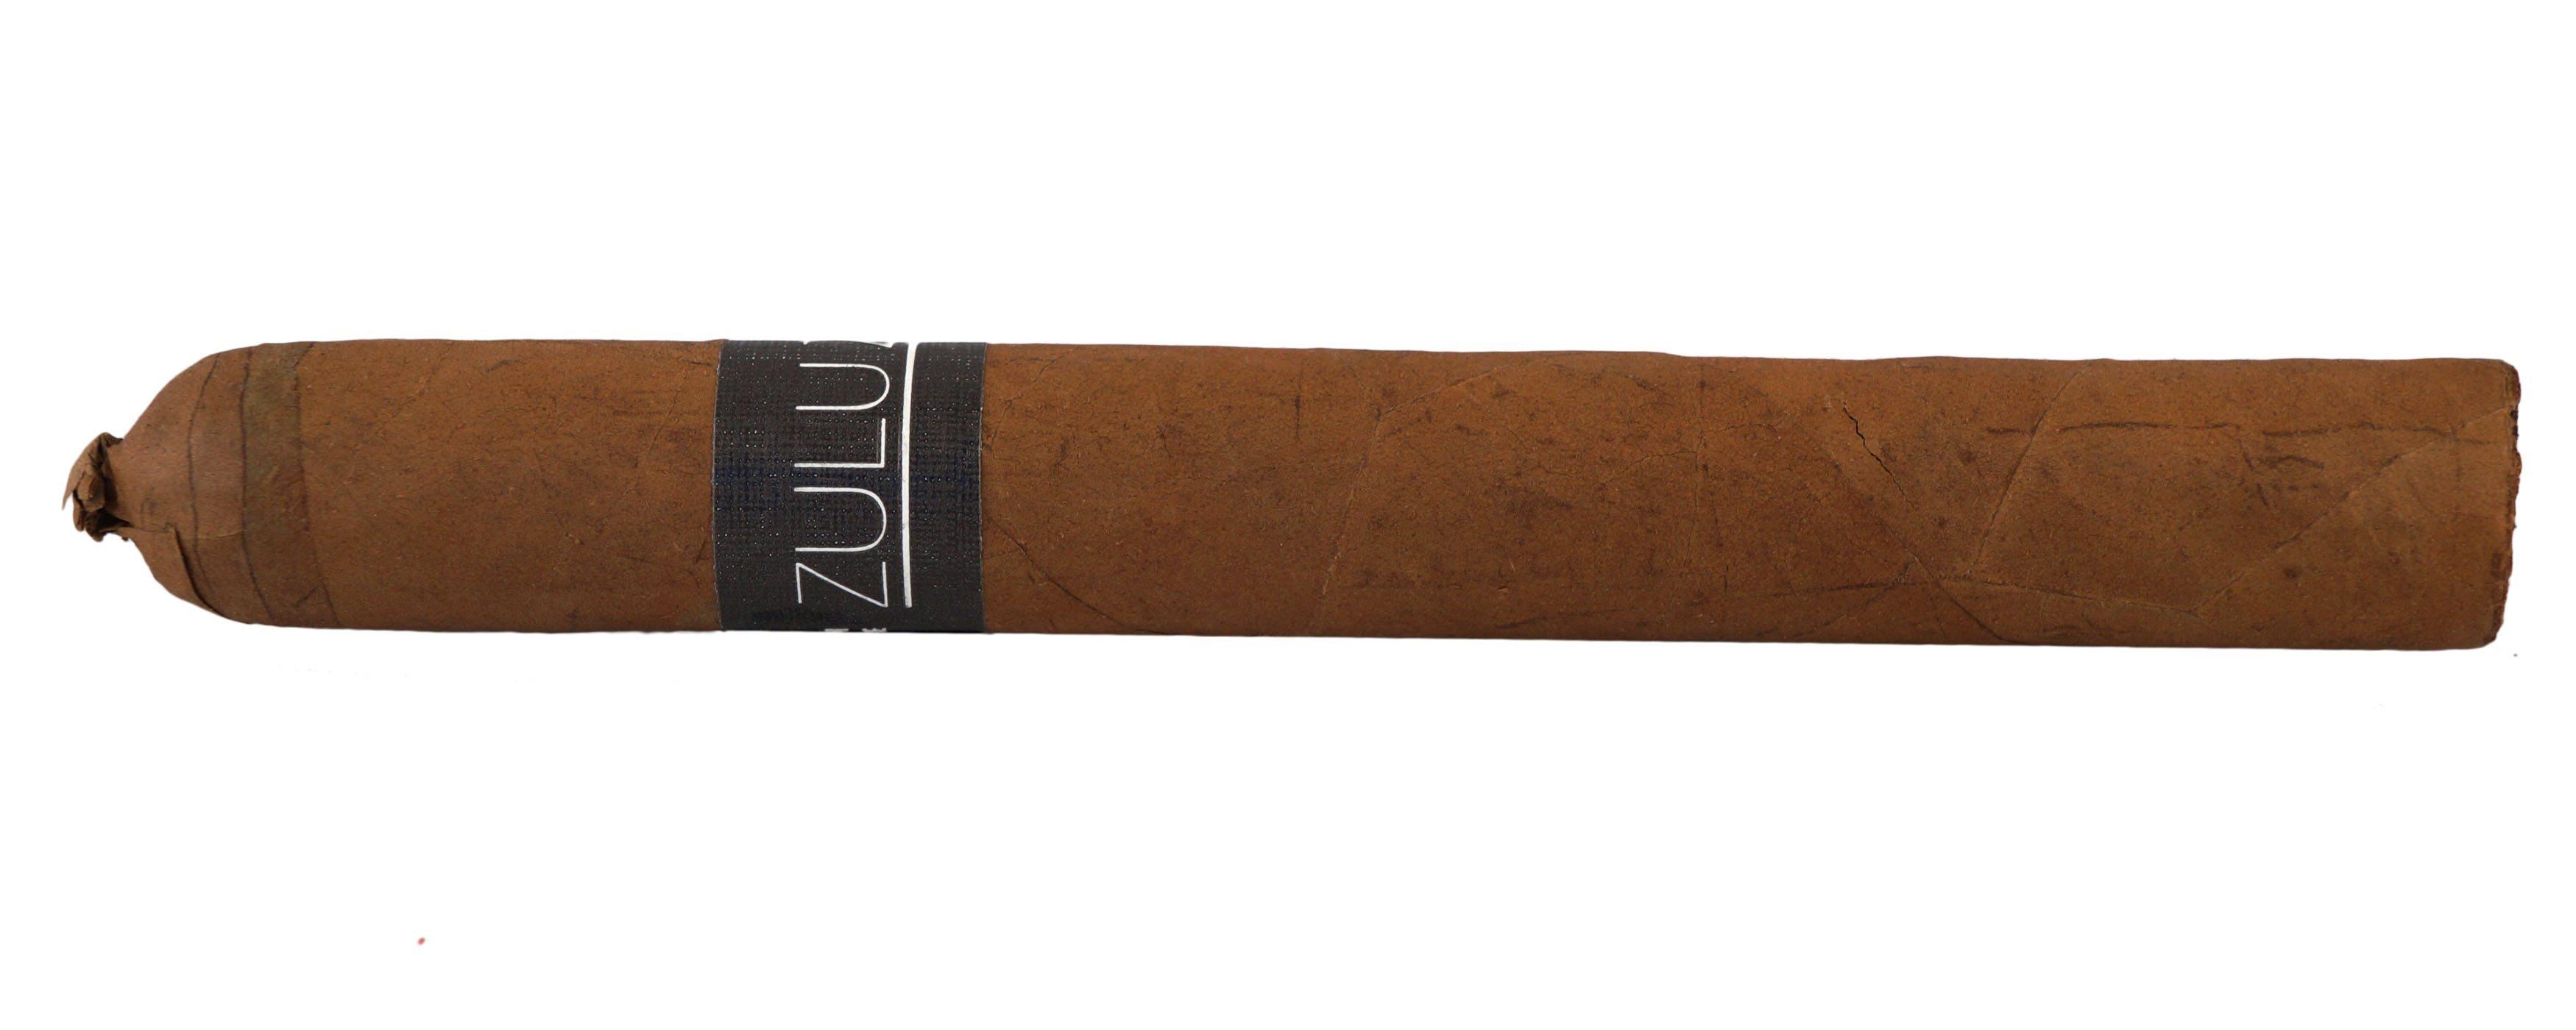 Blind Cigar Review: George Rico   S.T.K. Miami Zulu Zulu Mas Paz Edition Connecticut